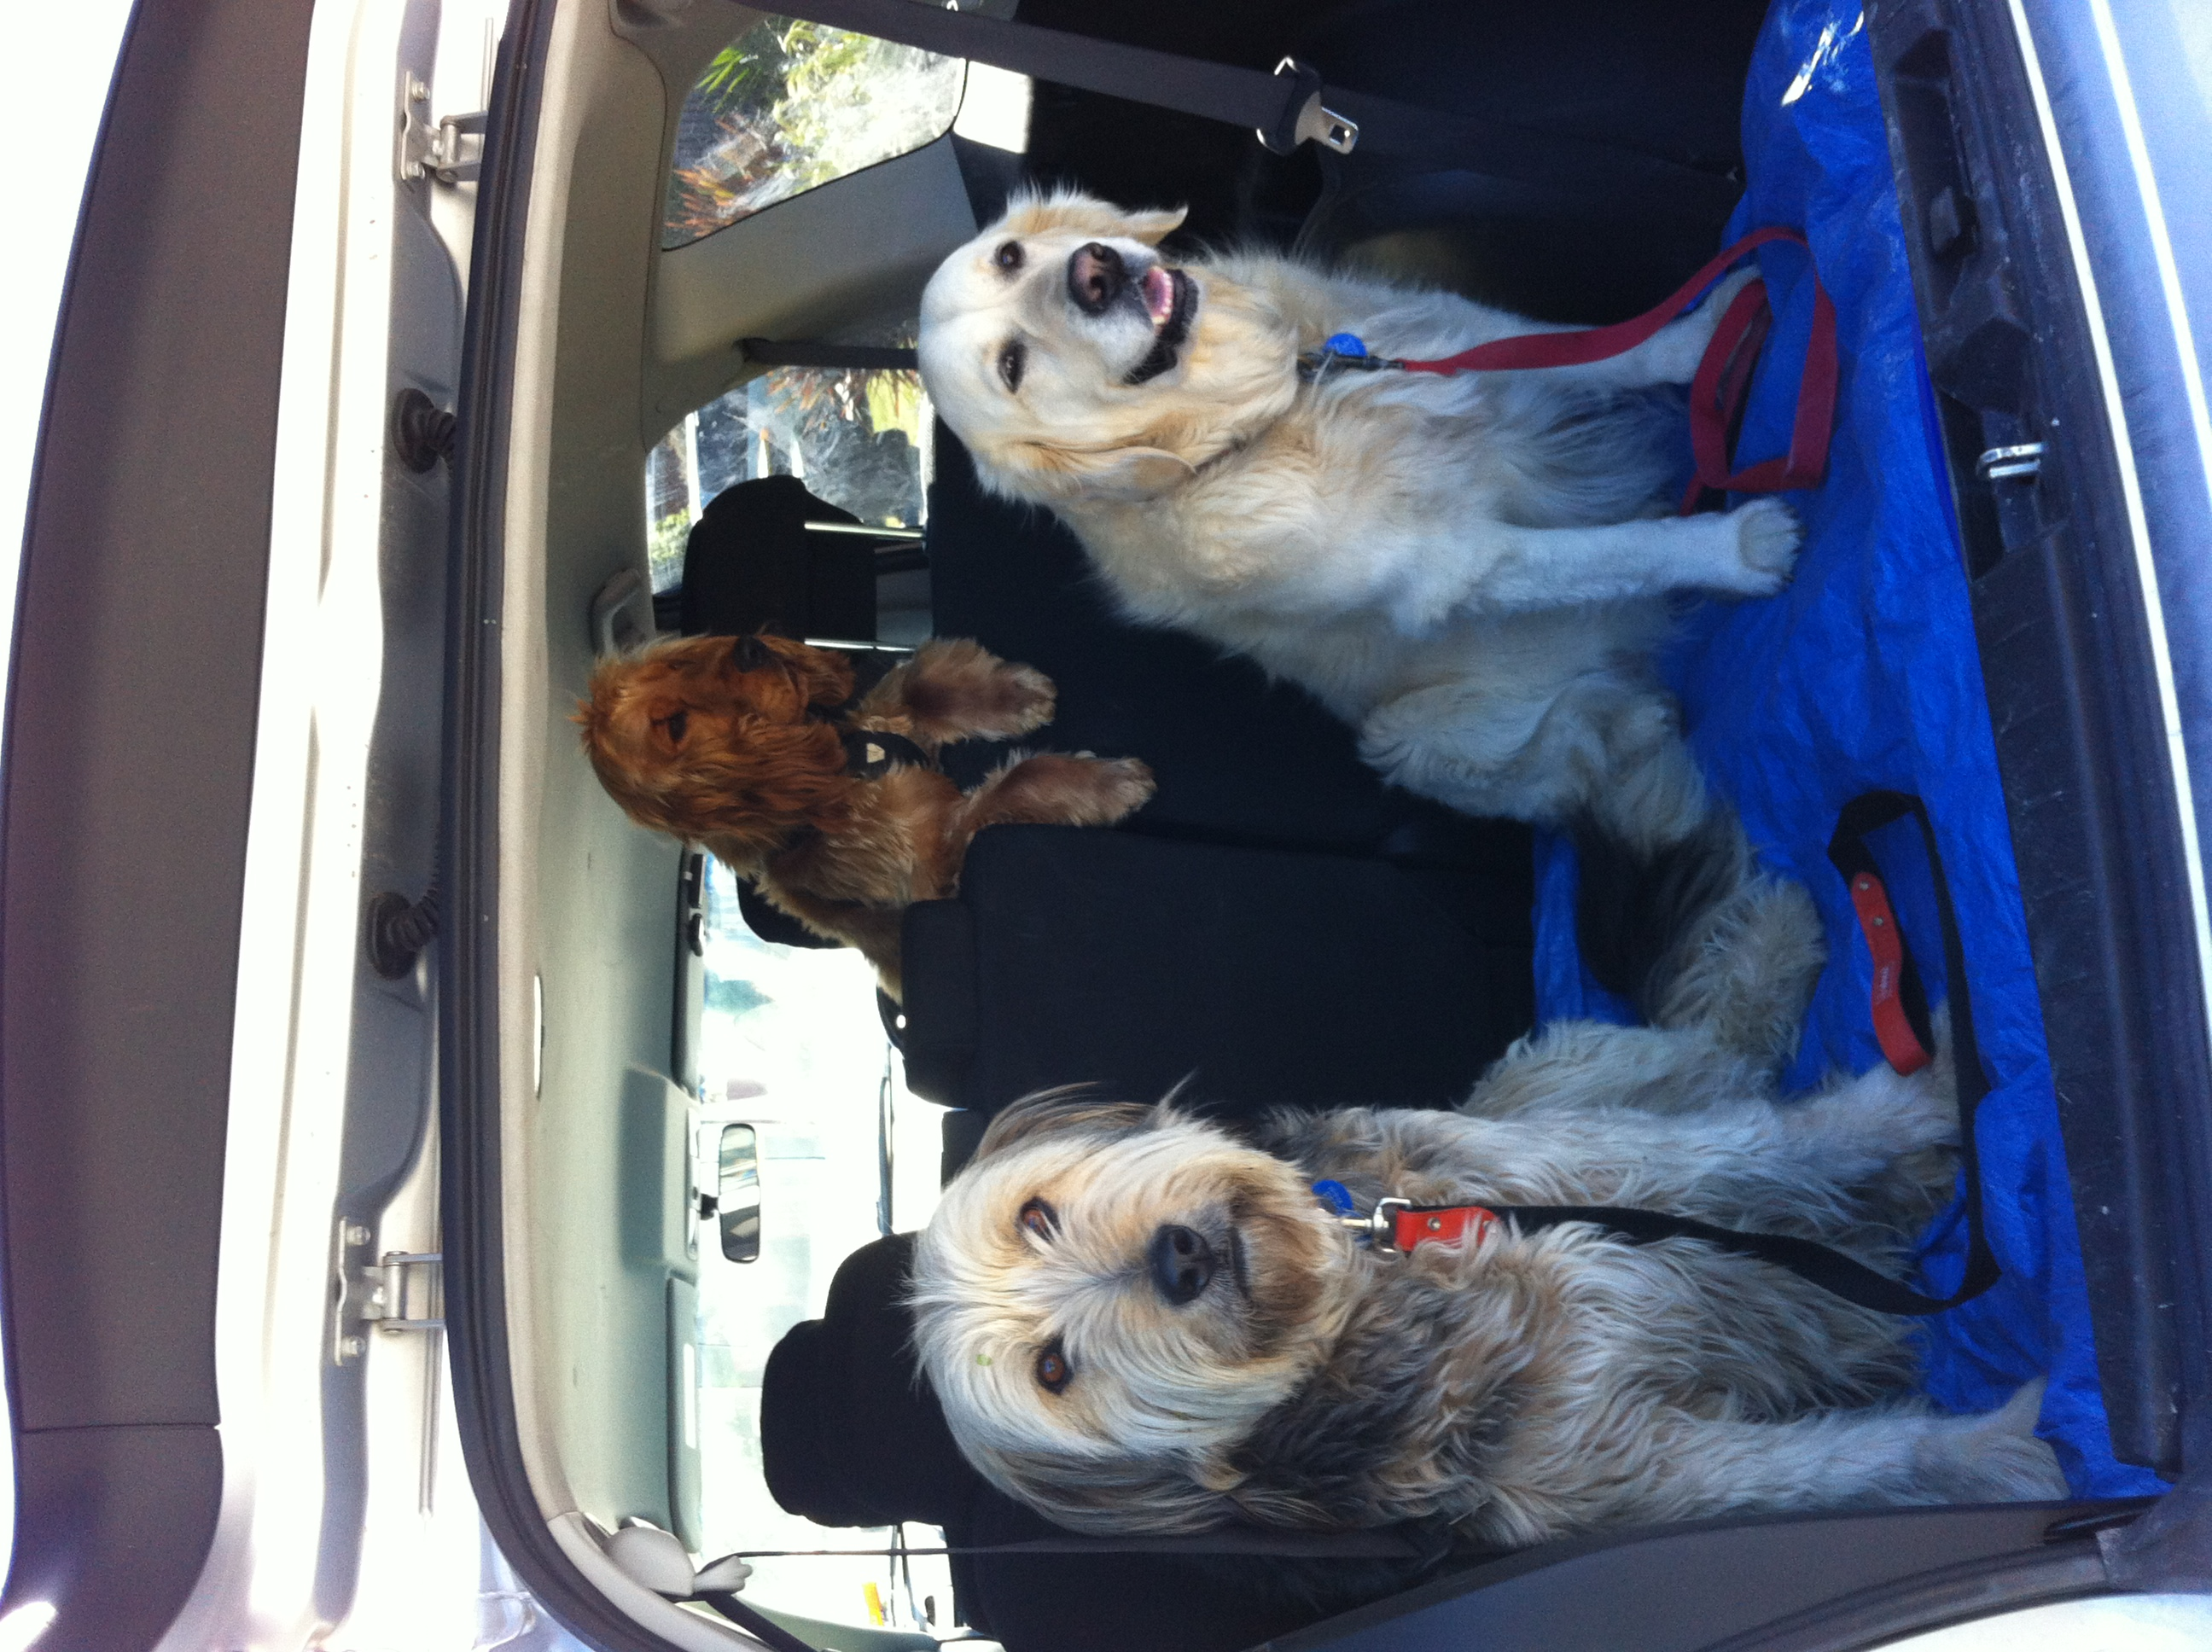 Doggies all ready for their walk